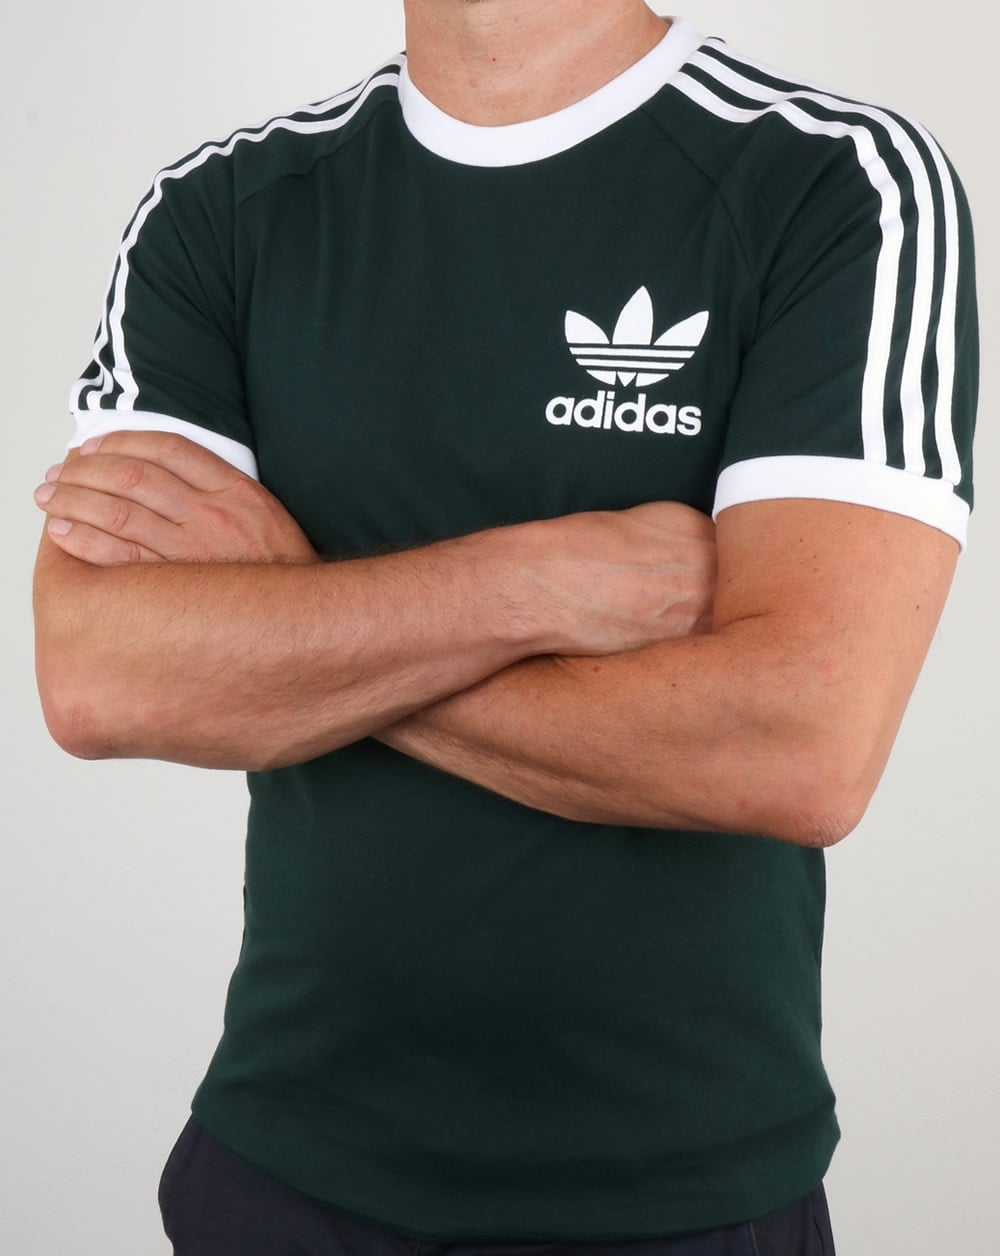 pretty cheap buying cheap new products Adidas Originals 3 Stripes T Shirt Green Night